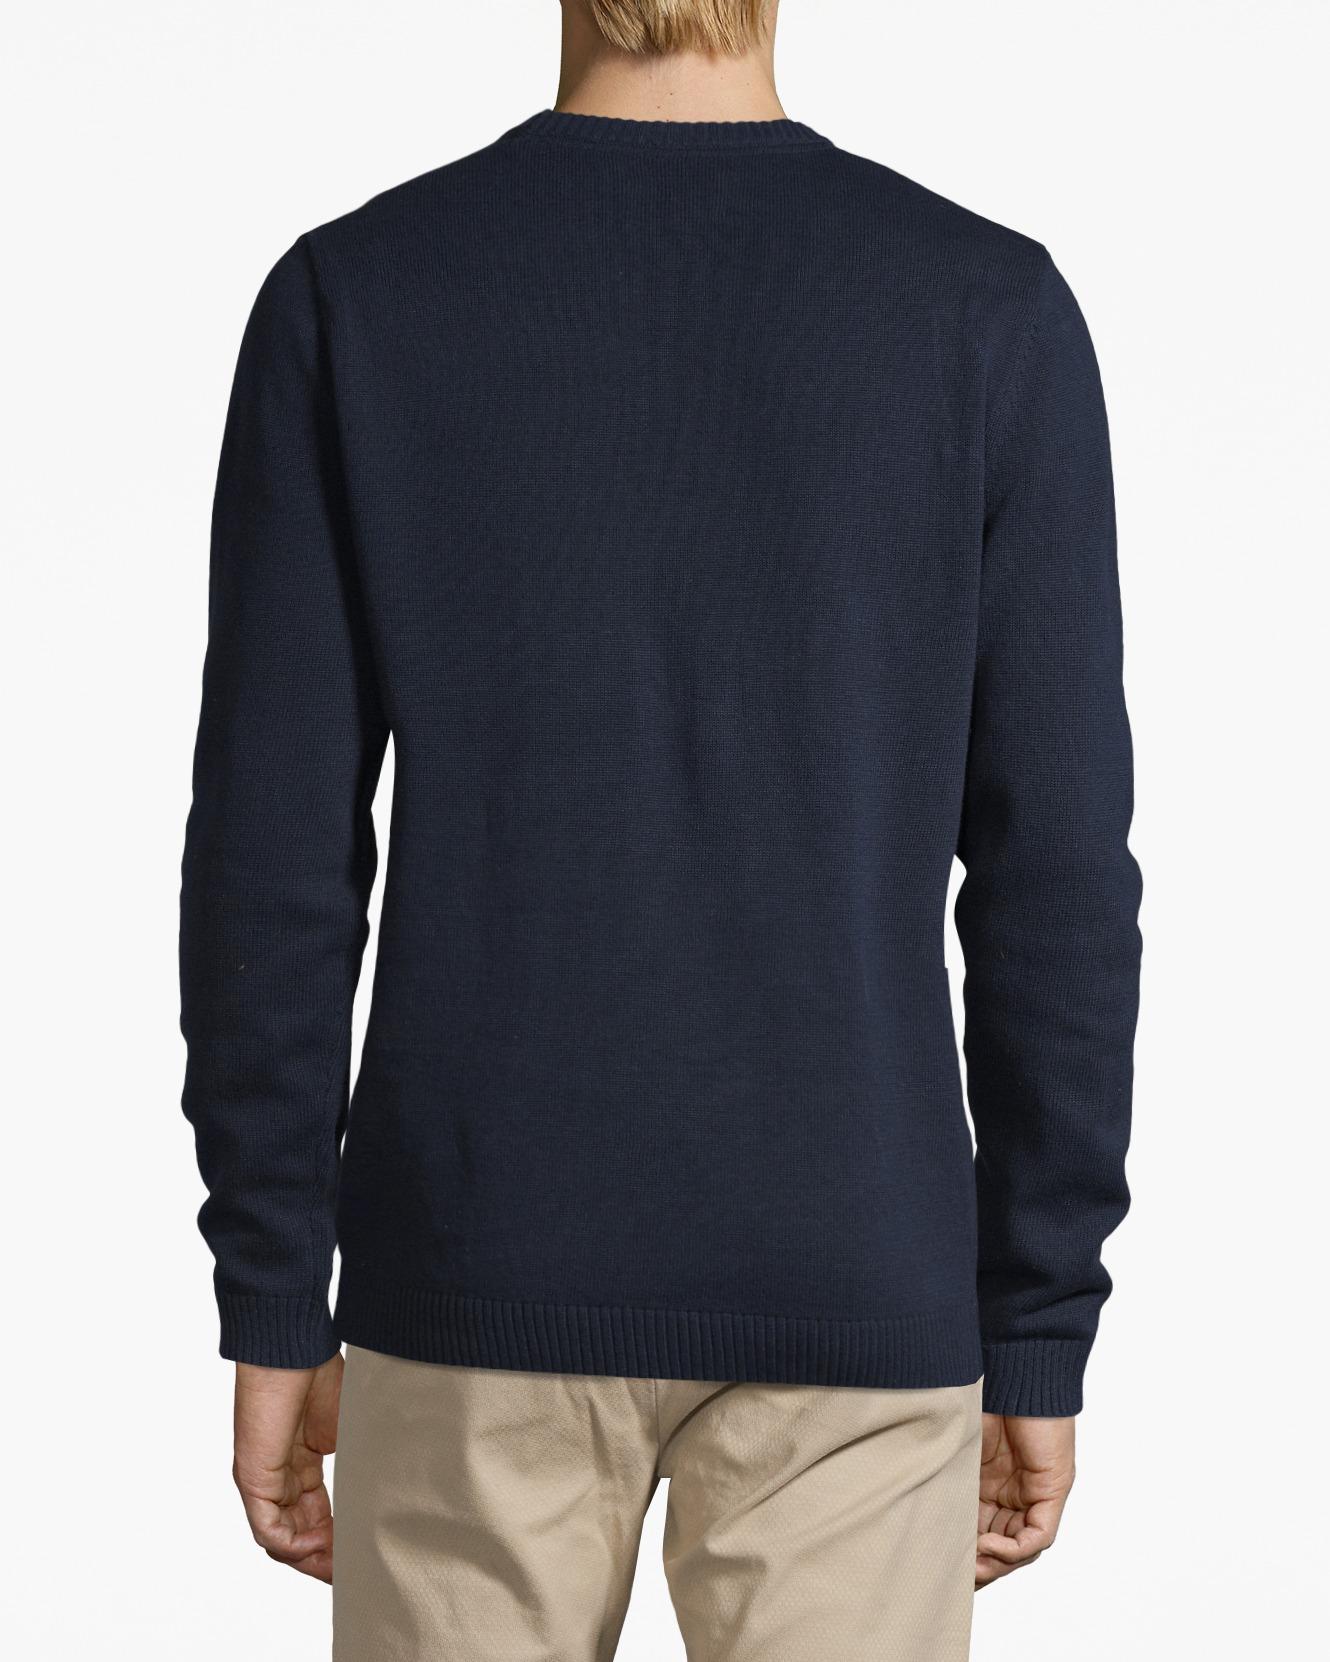 Nelson Knitted Sweatshirt deepest Blue | Shoppa Online | Afound